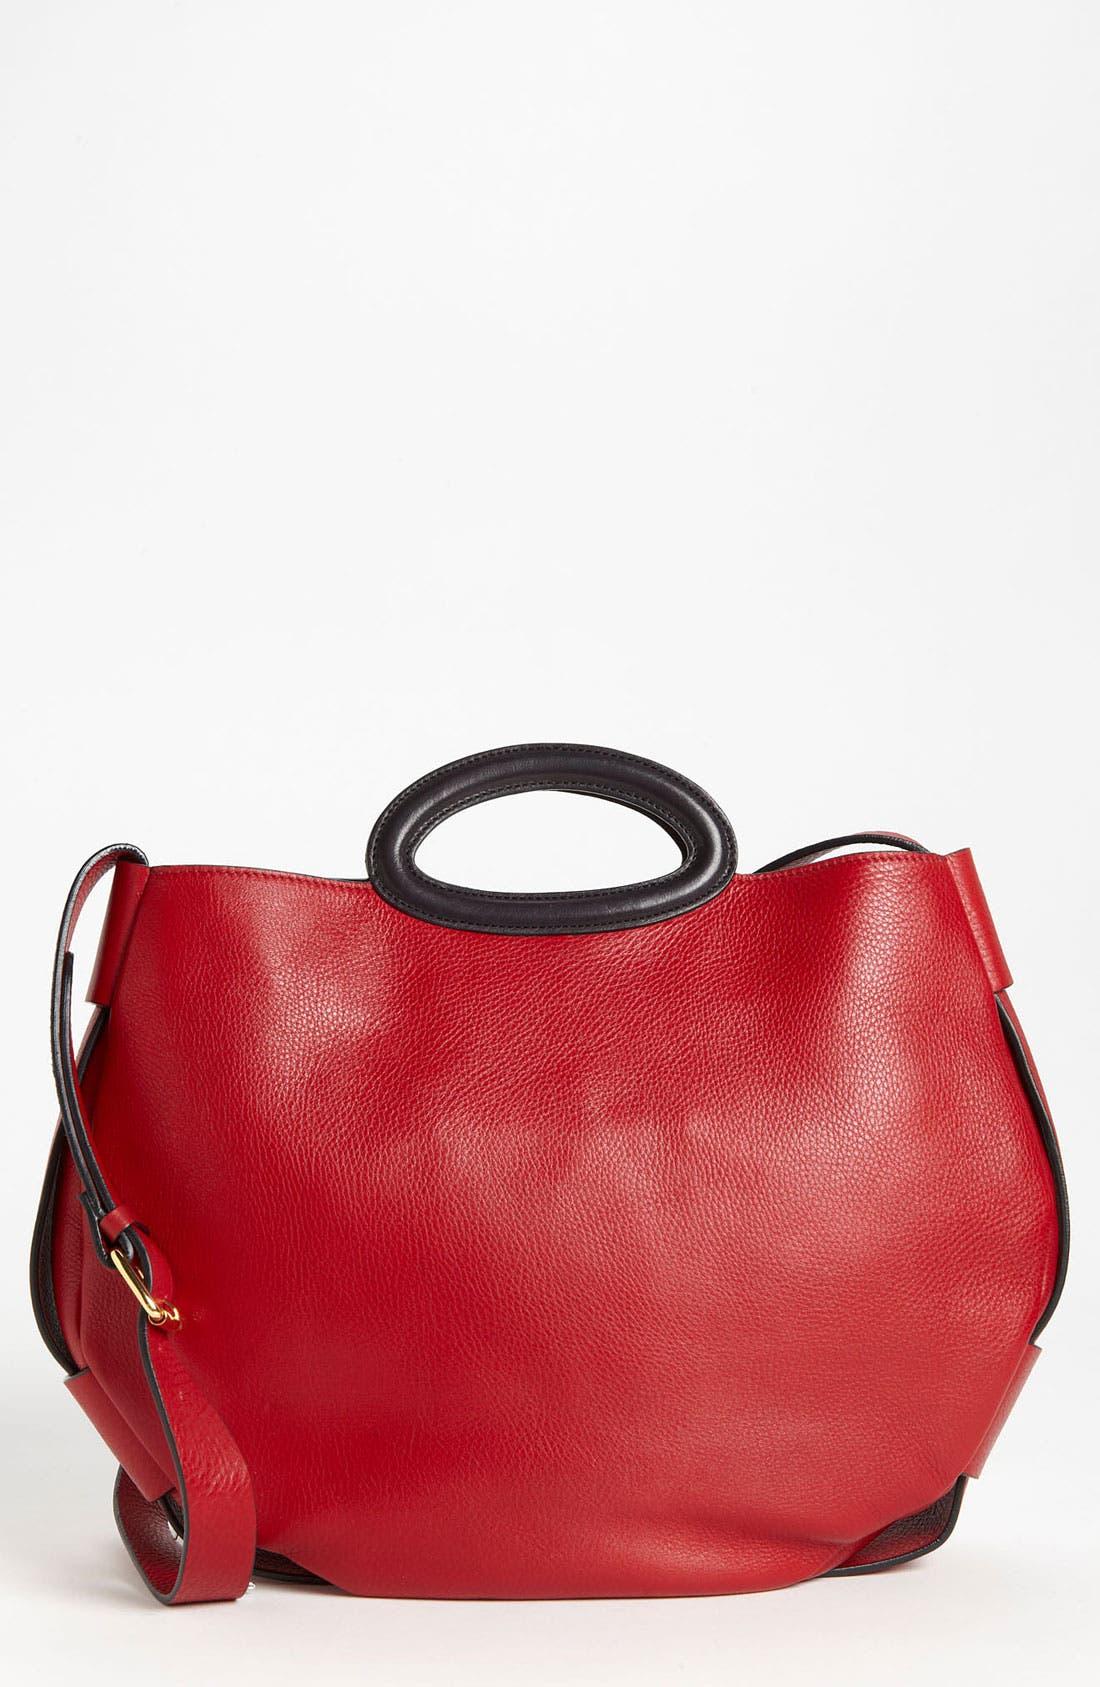 Main Image - Marni 'Balloon - Medium' Leather Crossbody Bag